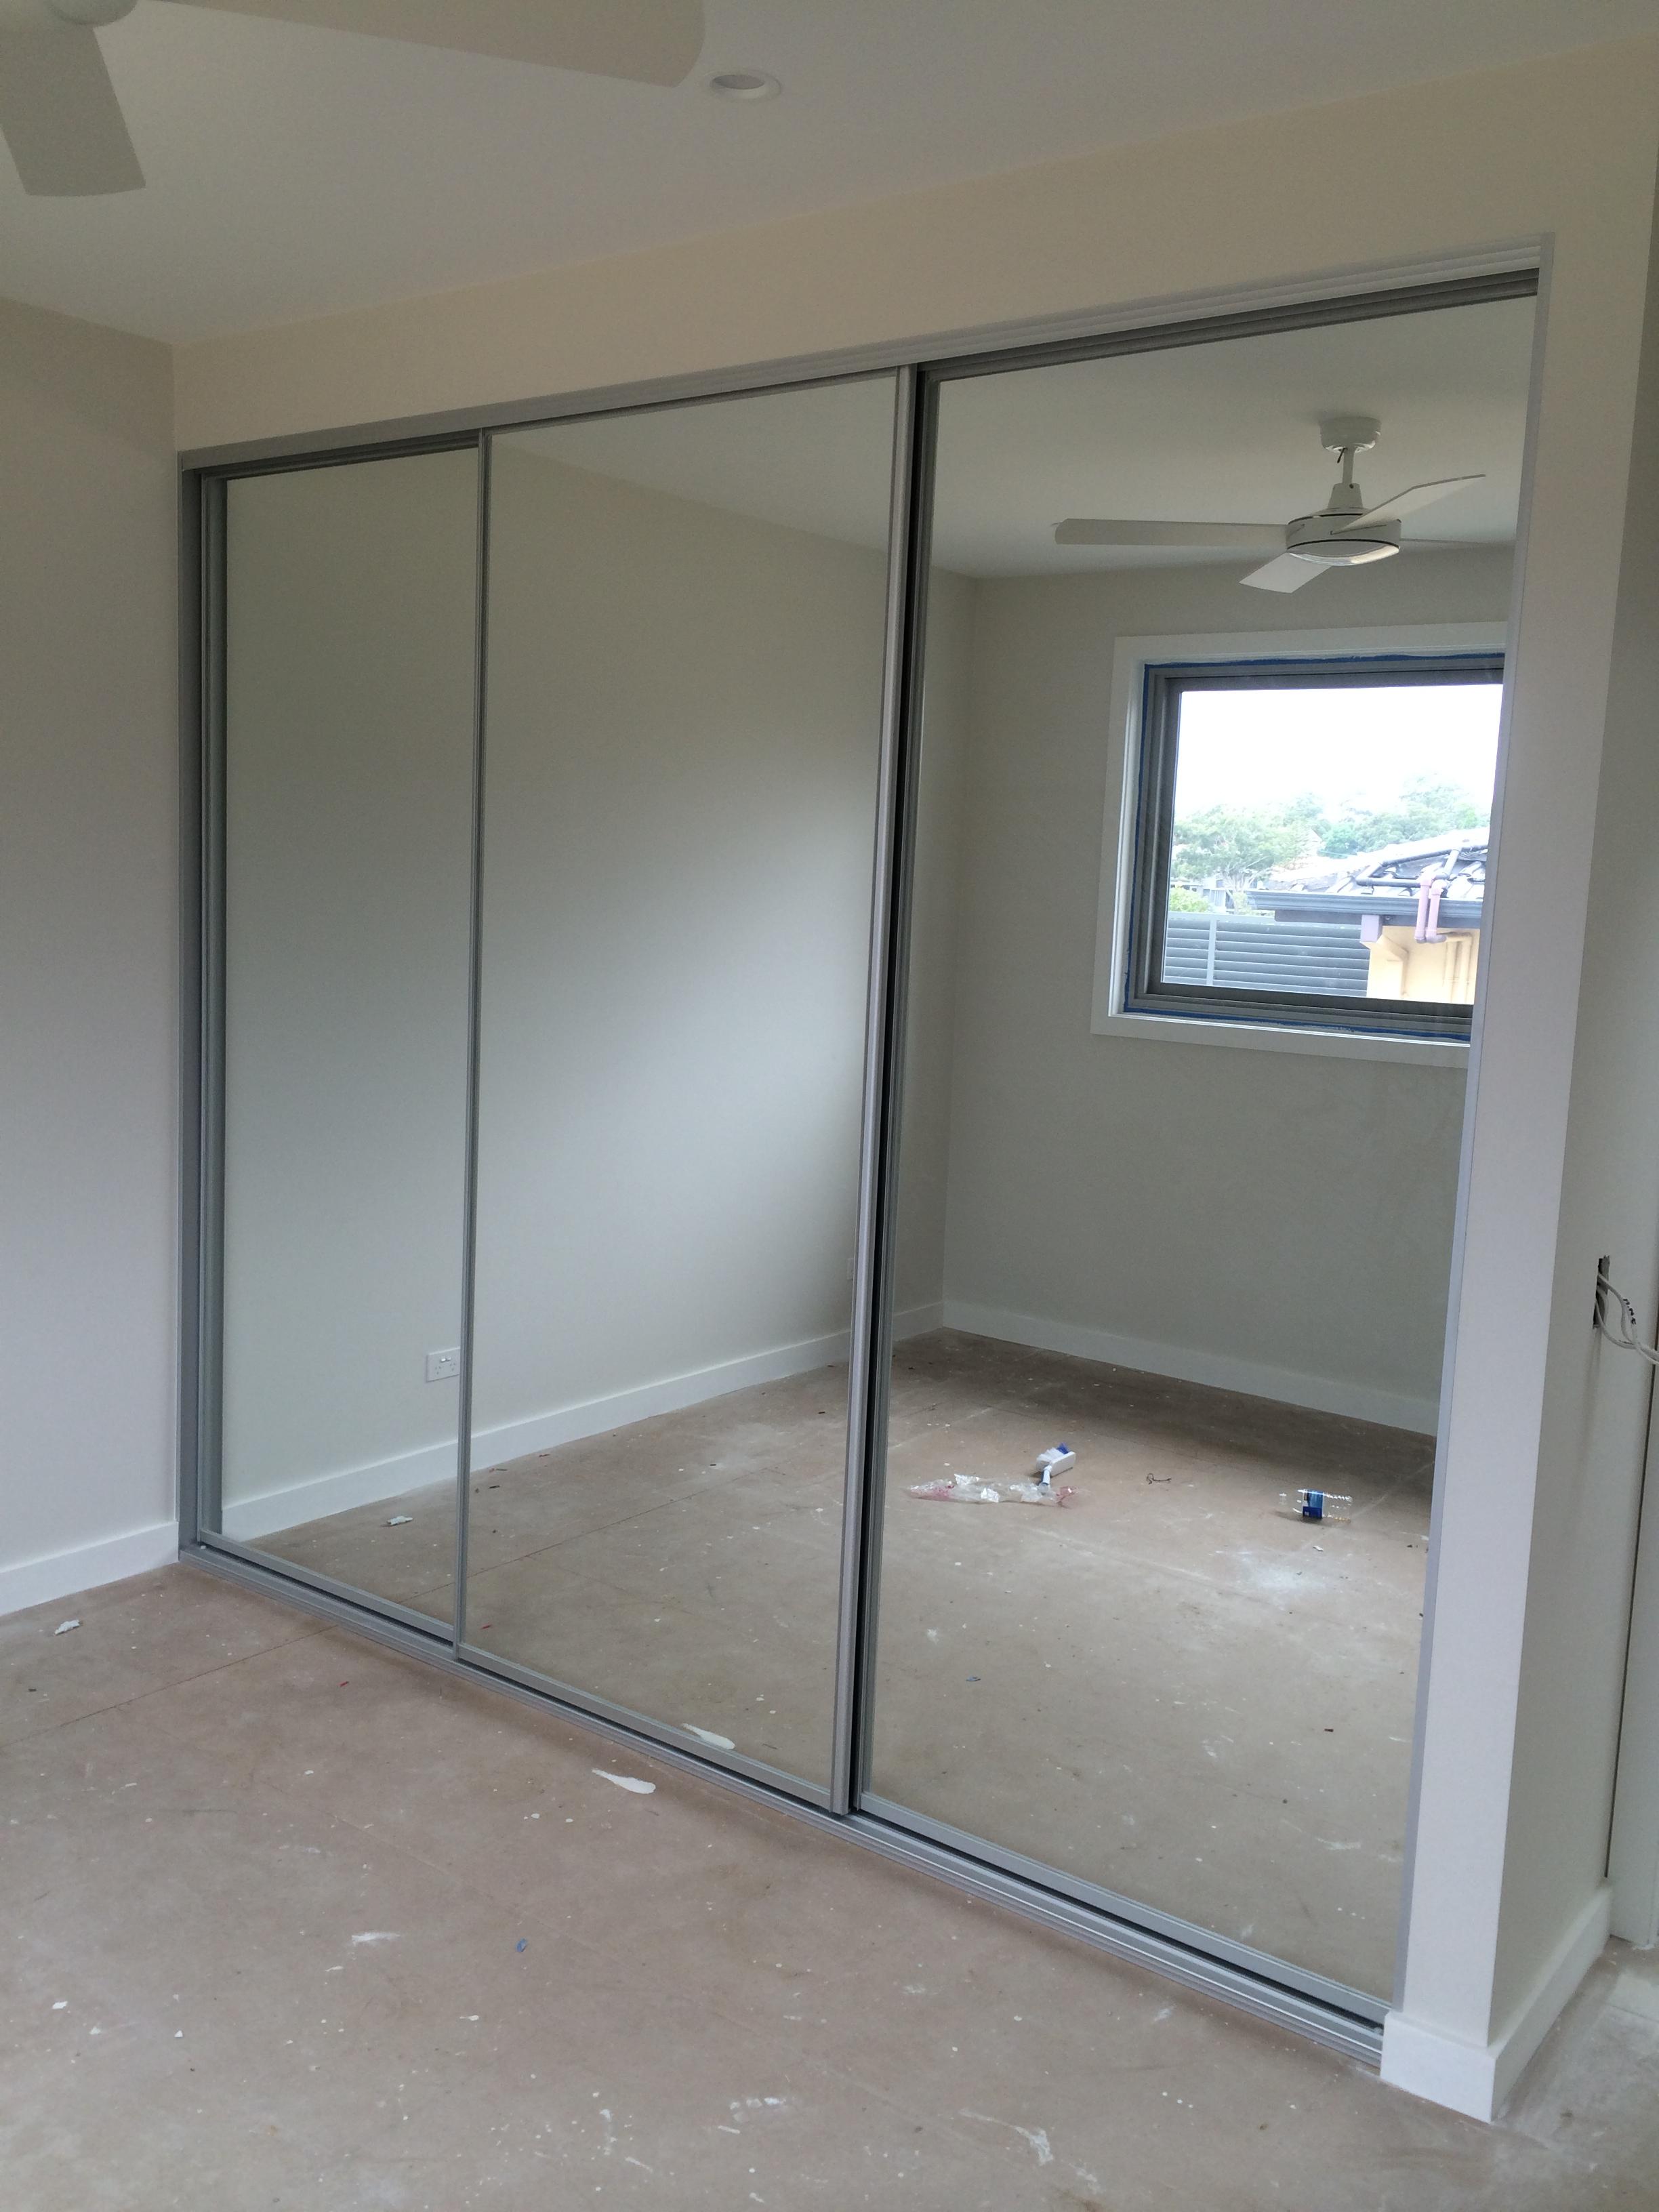 three door mirror wardrobe in existing gyprock frame.JPG